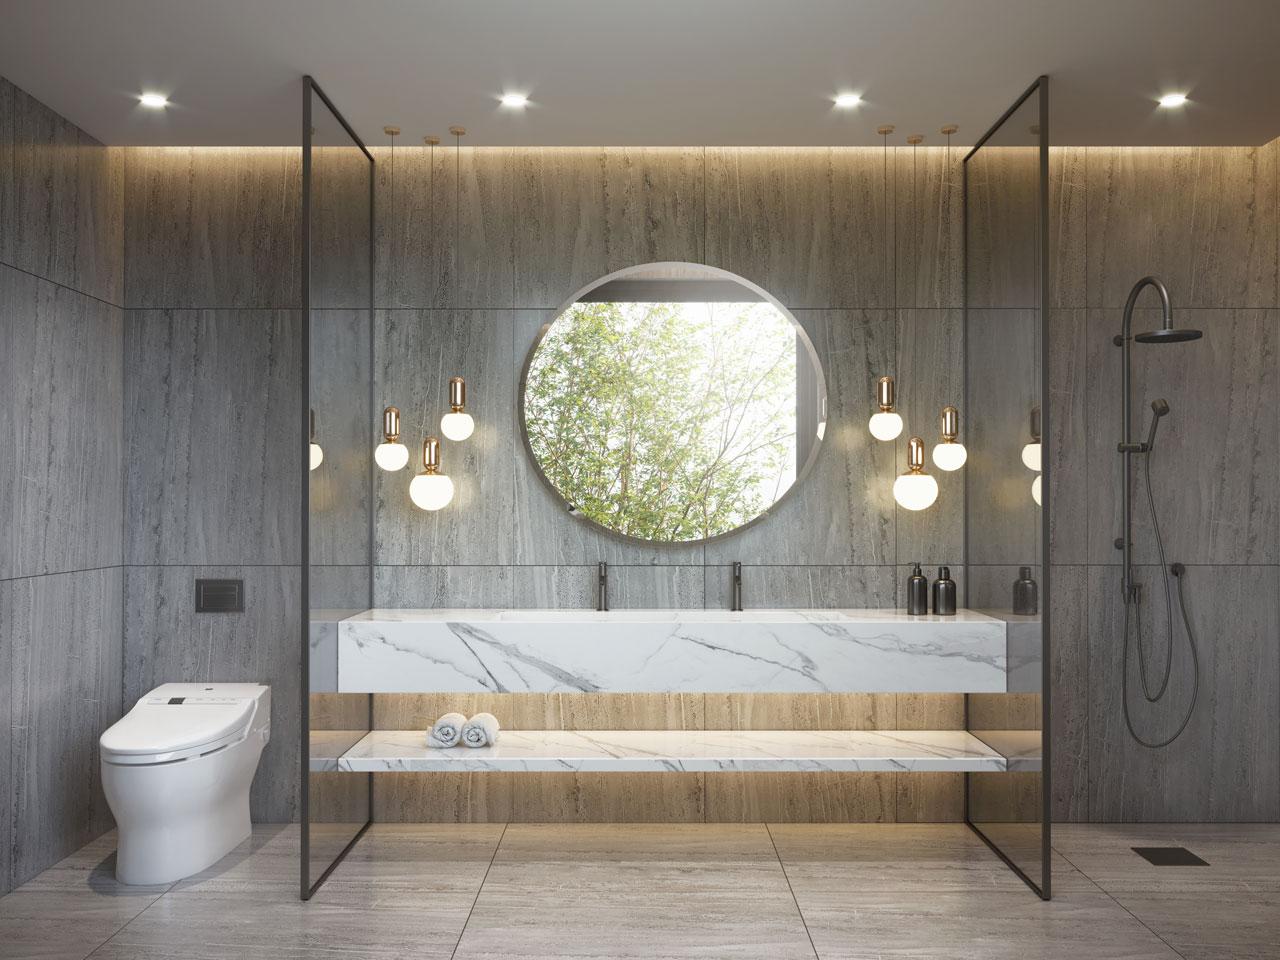 Beautiful simplistic bathroom design